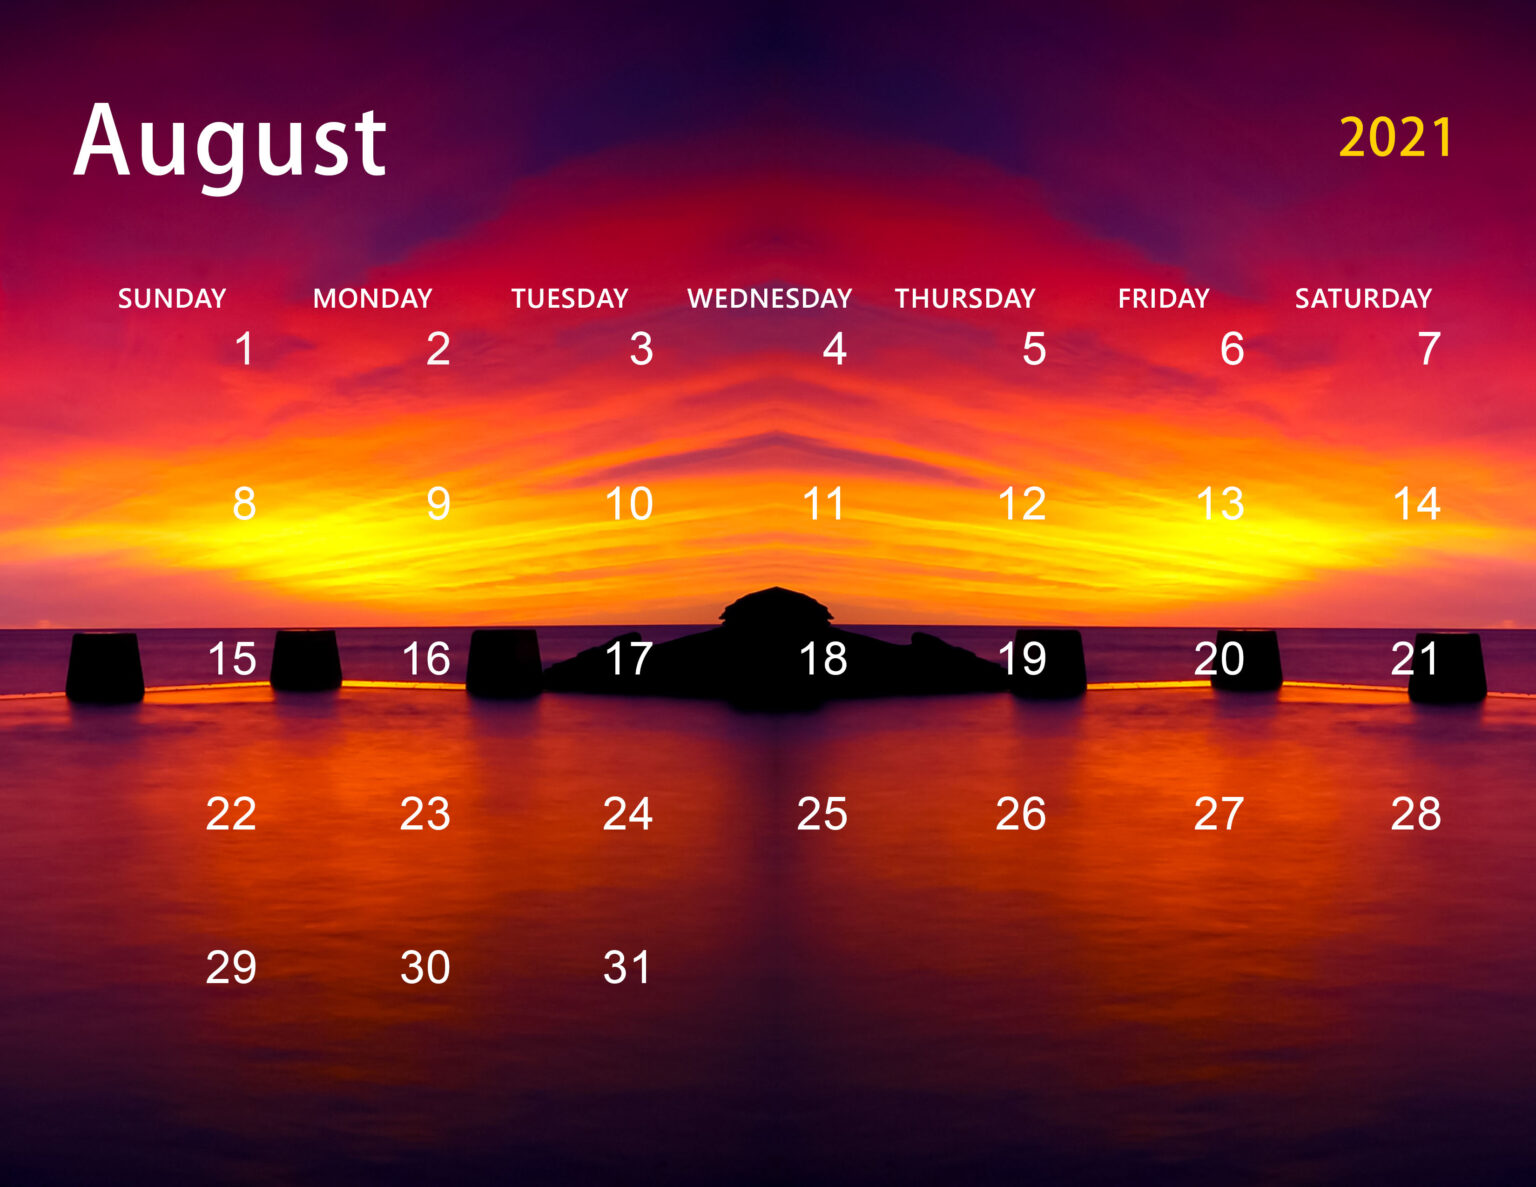 Cute August 2021 Calendar Printable